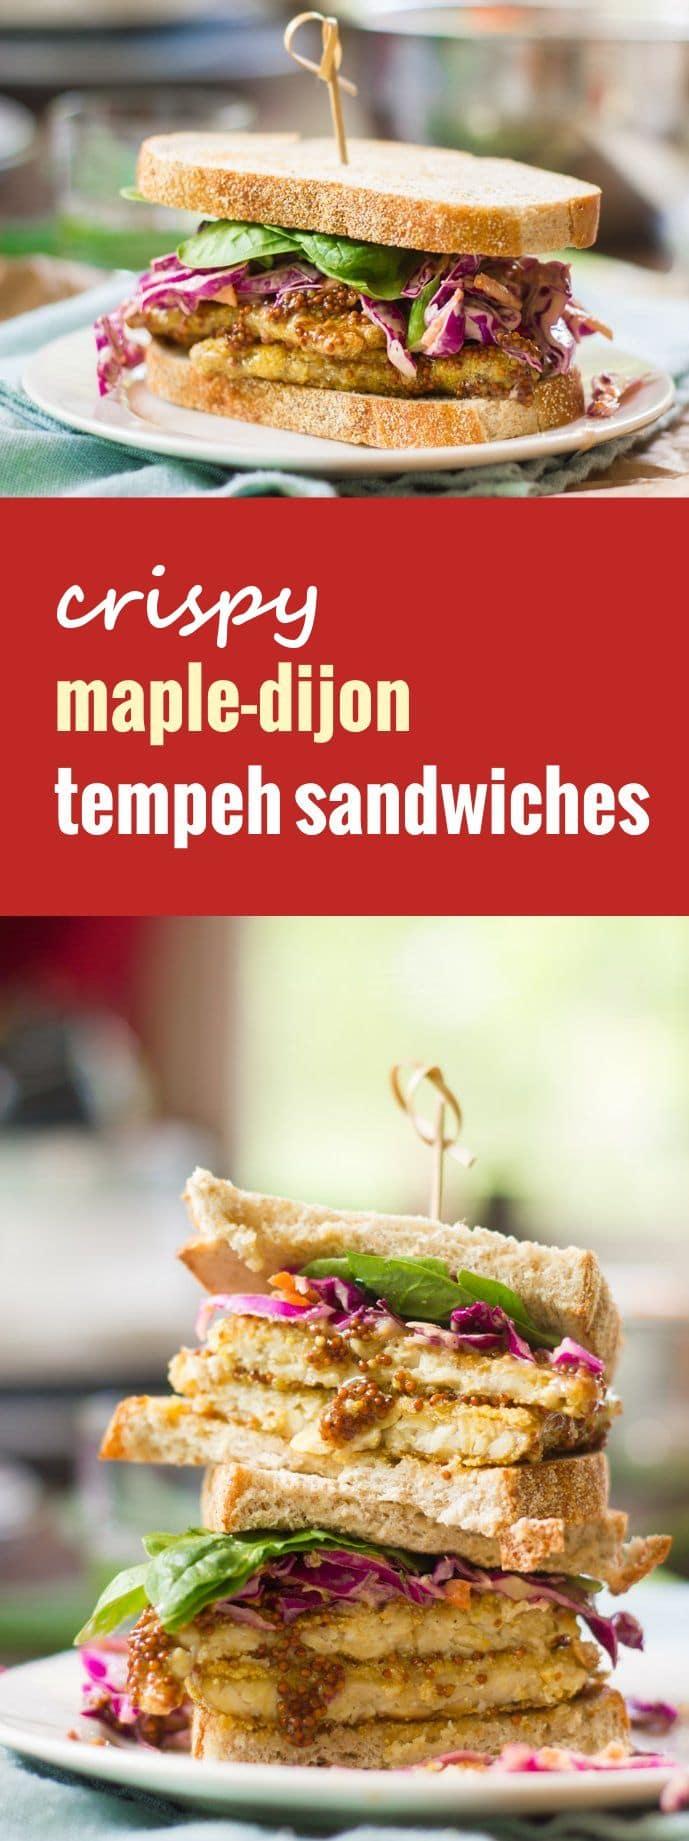 Crispy Maple-Dijon Tempeh Sandwiches